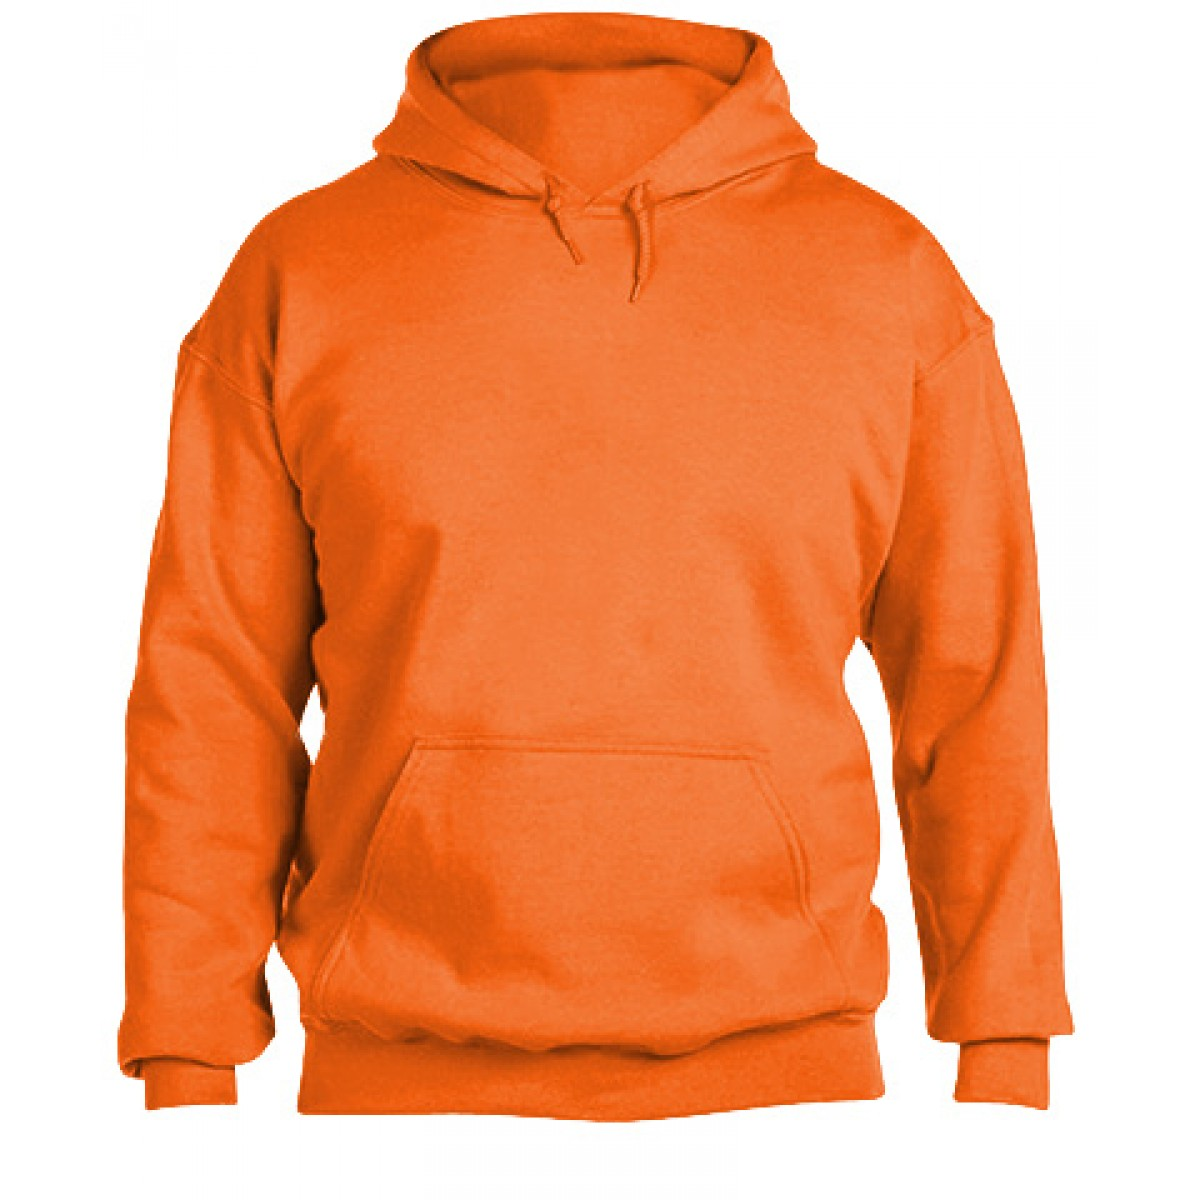 Solid Hooded Sweatshirt  50/50 Heavy Blend-Safety Orange-3XL